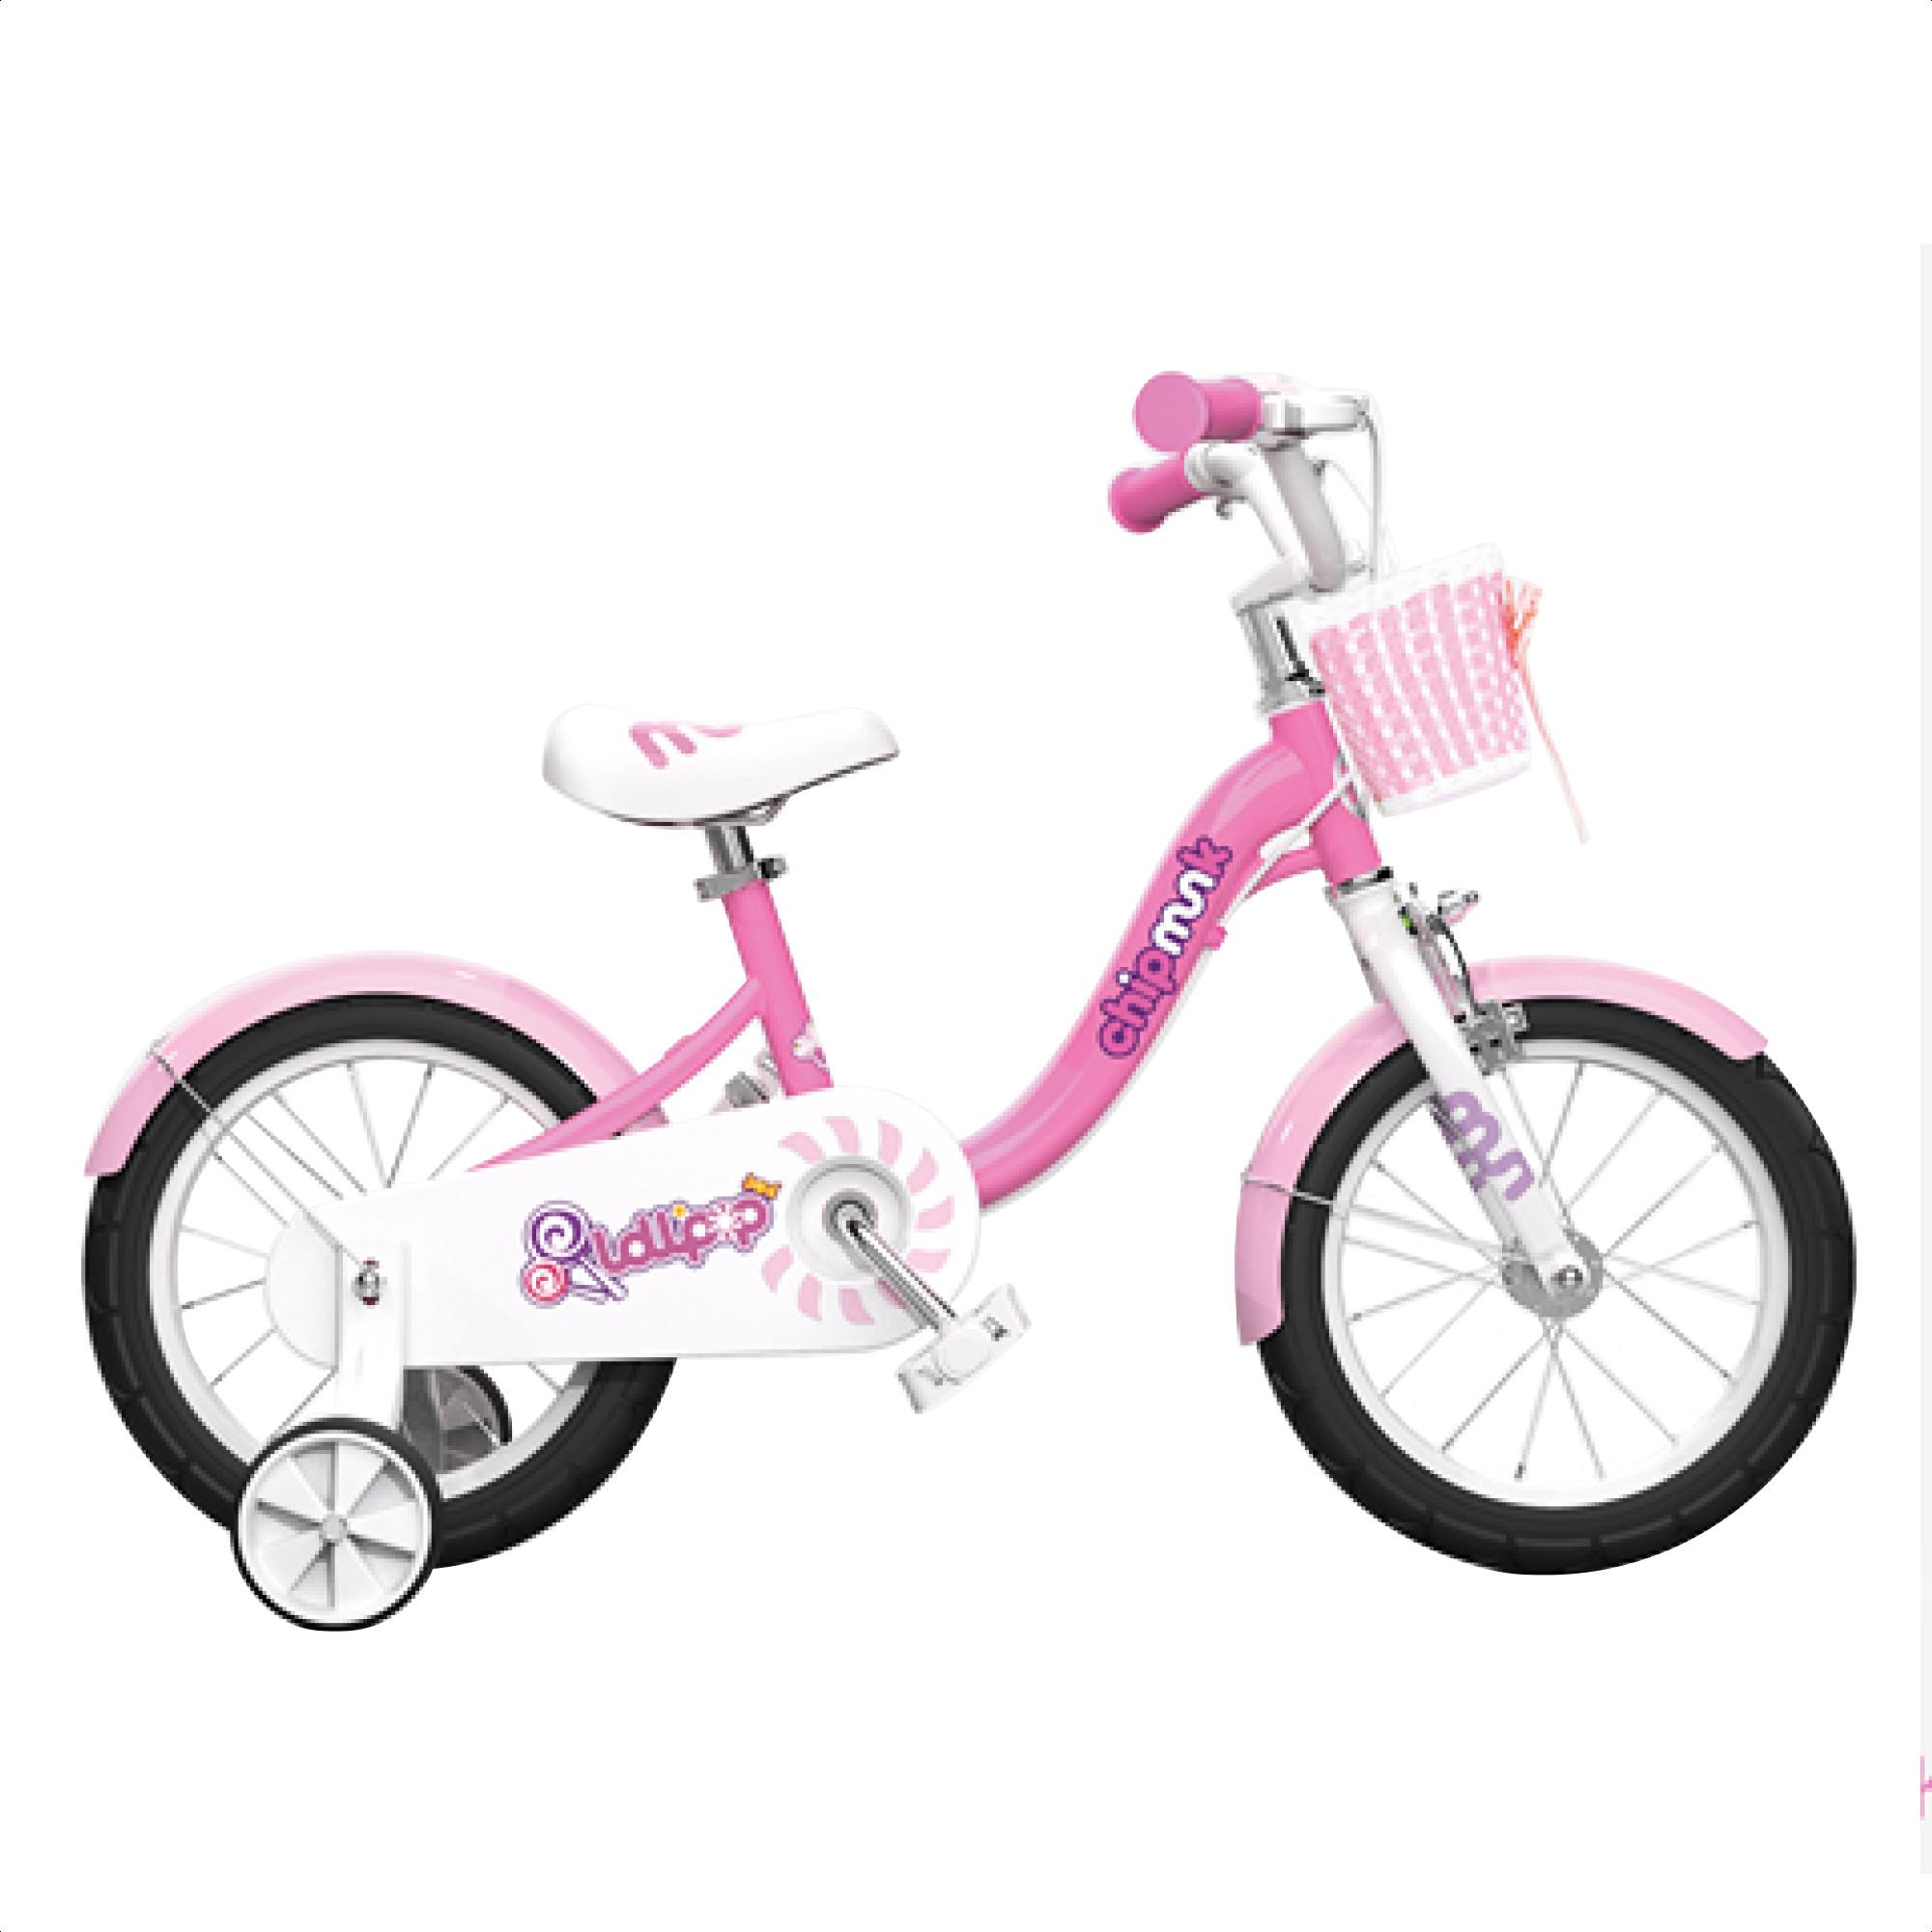 Bicicleta Infantil Royal Baby Chipmunk Mm Rodado 14